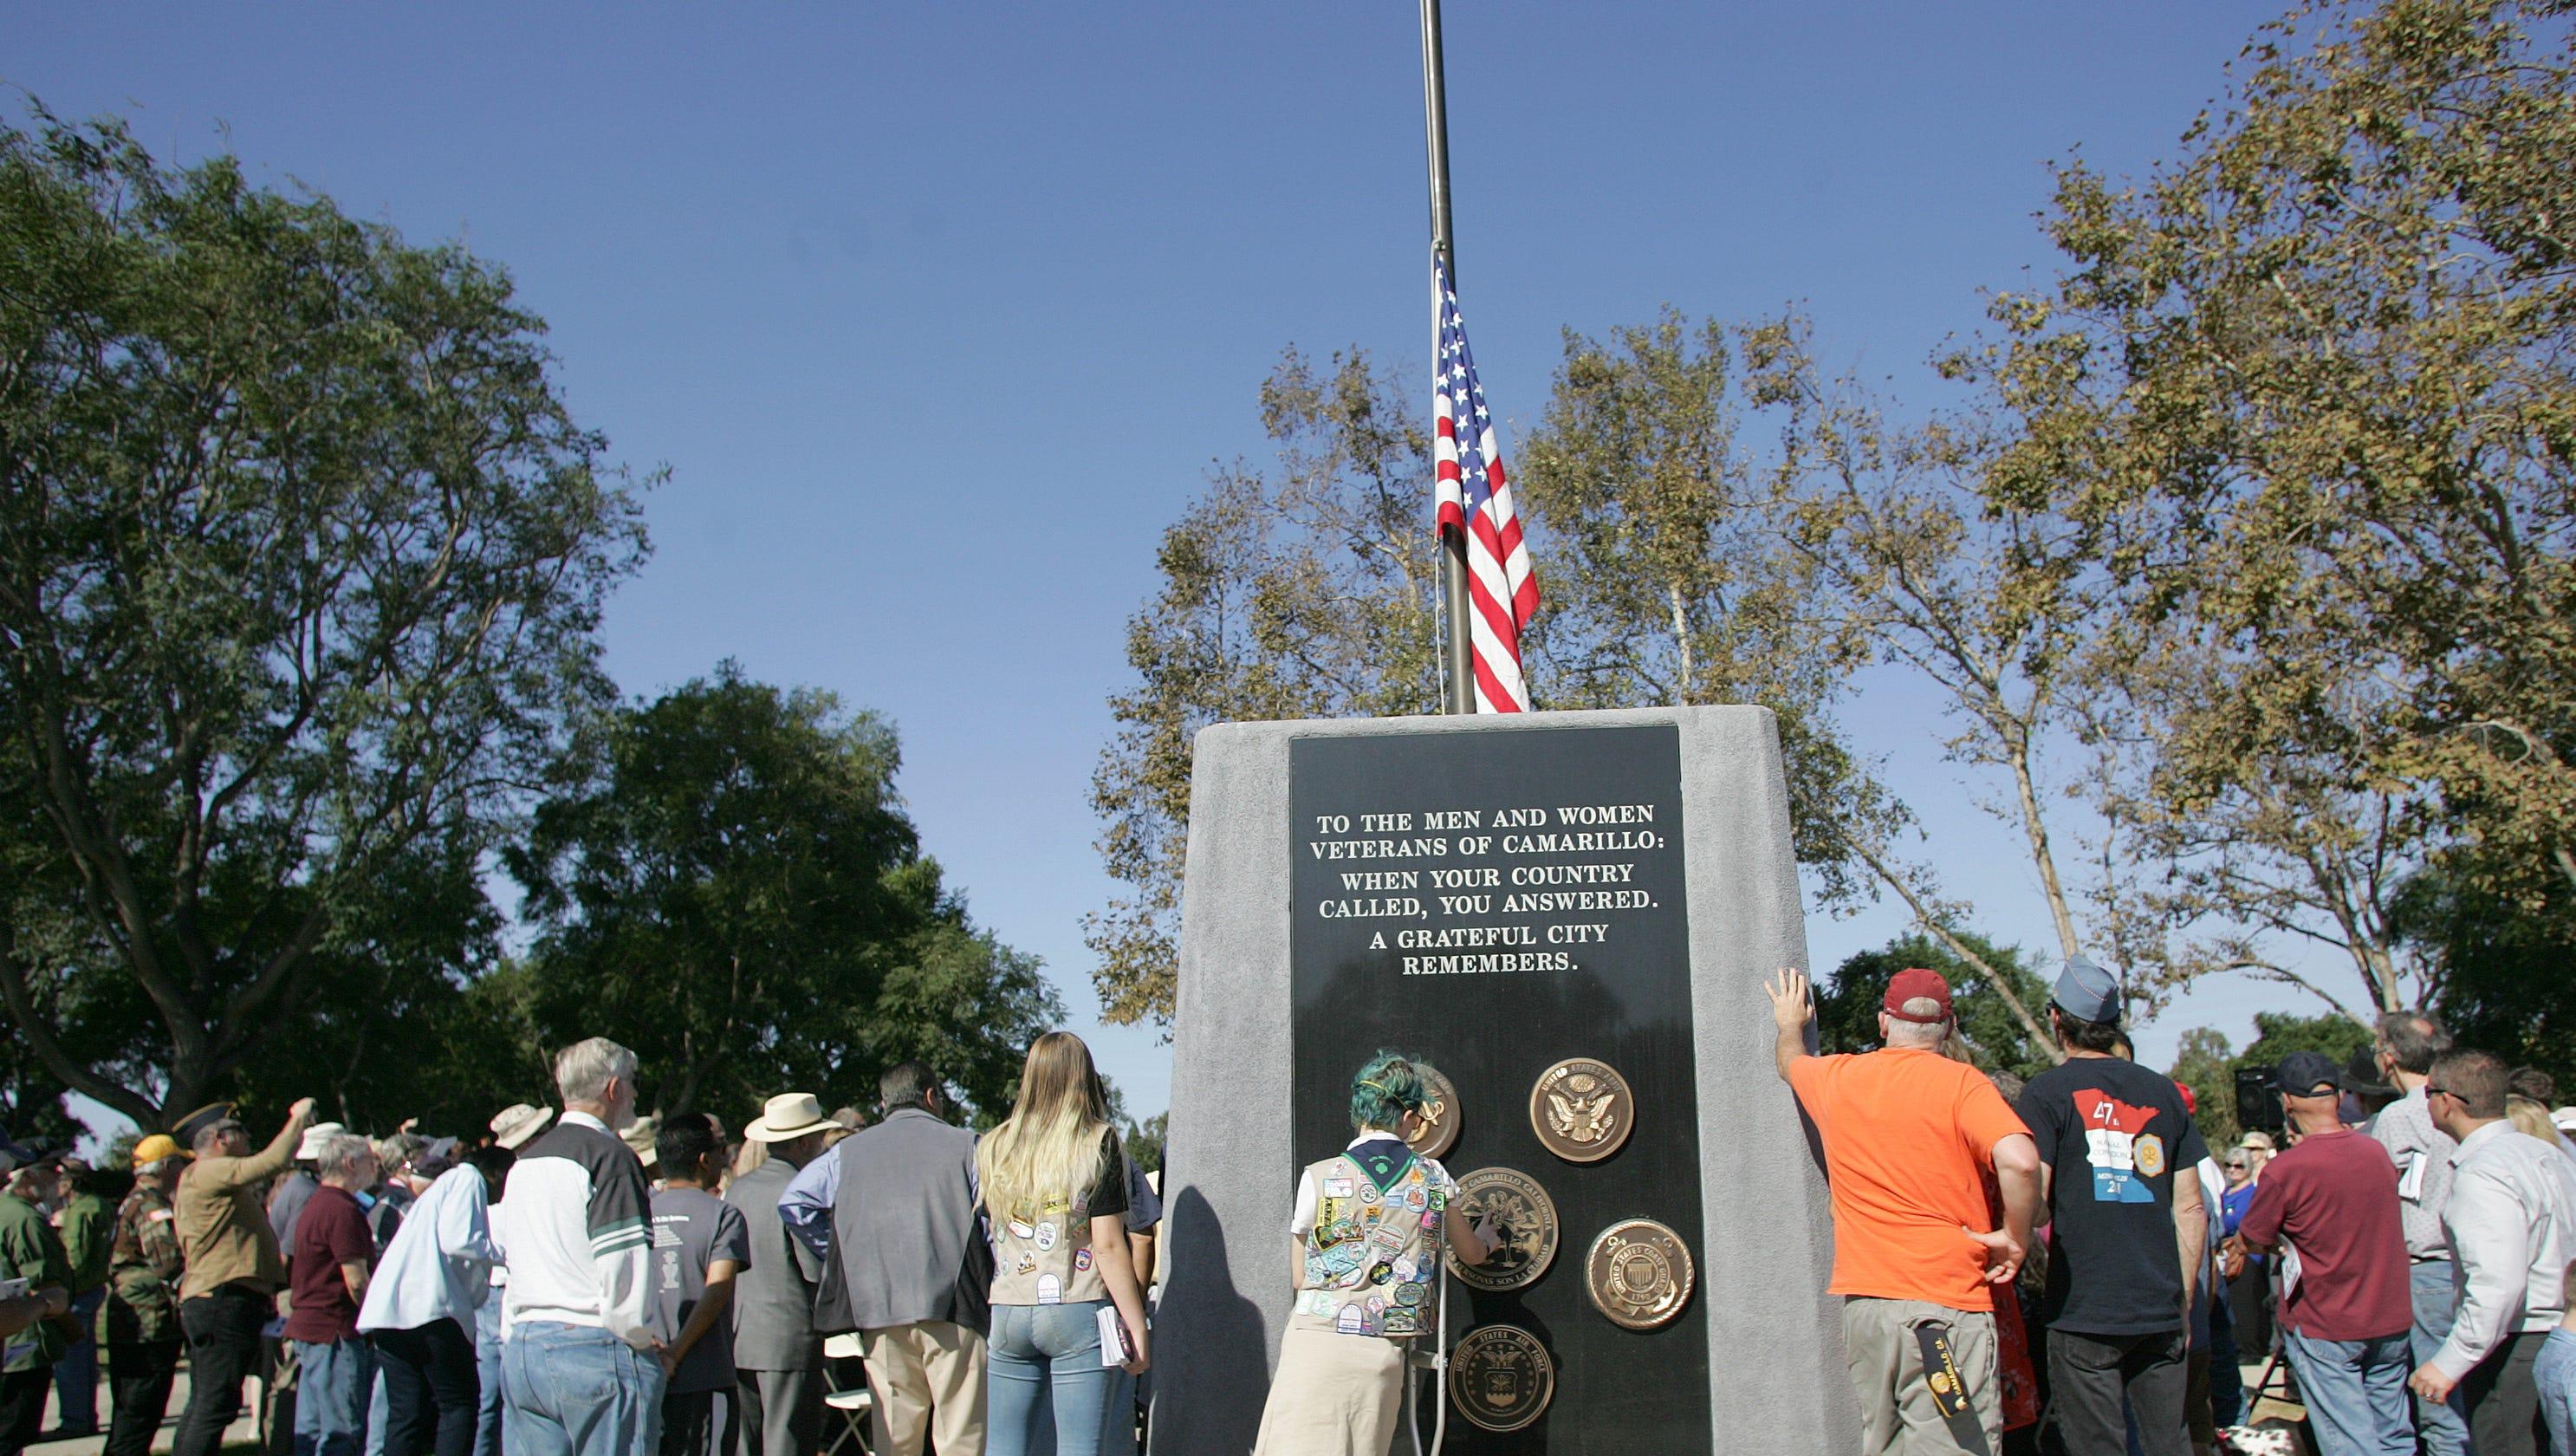 Camarillo Pays Tribute To Fallen Wartime Veterans